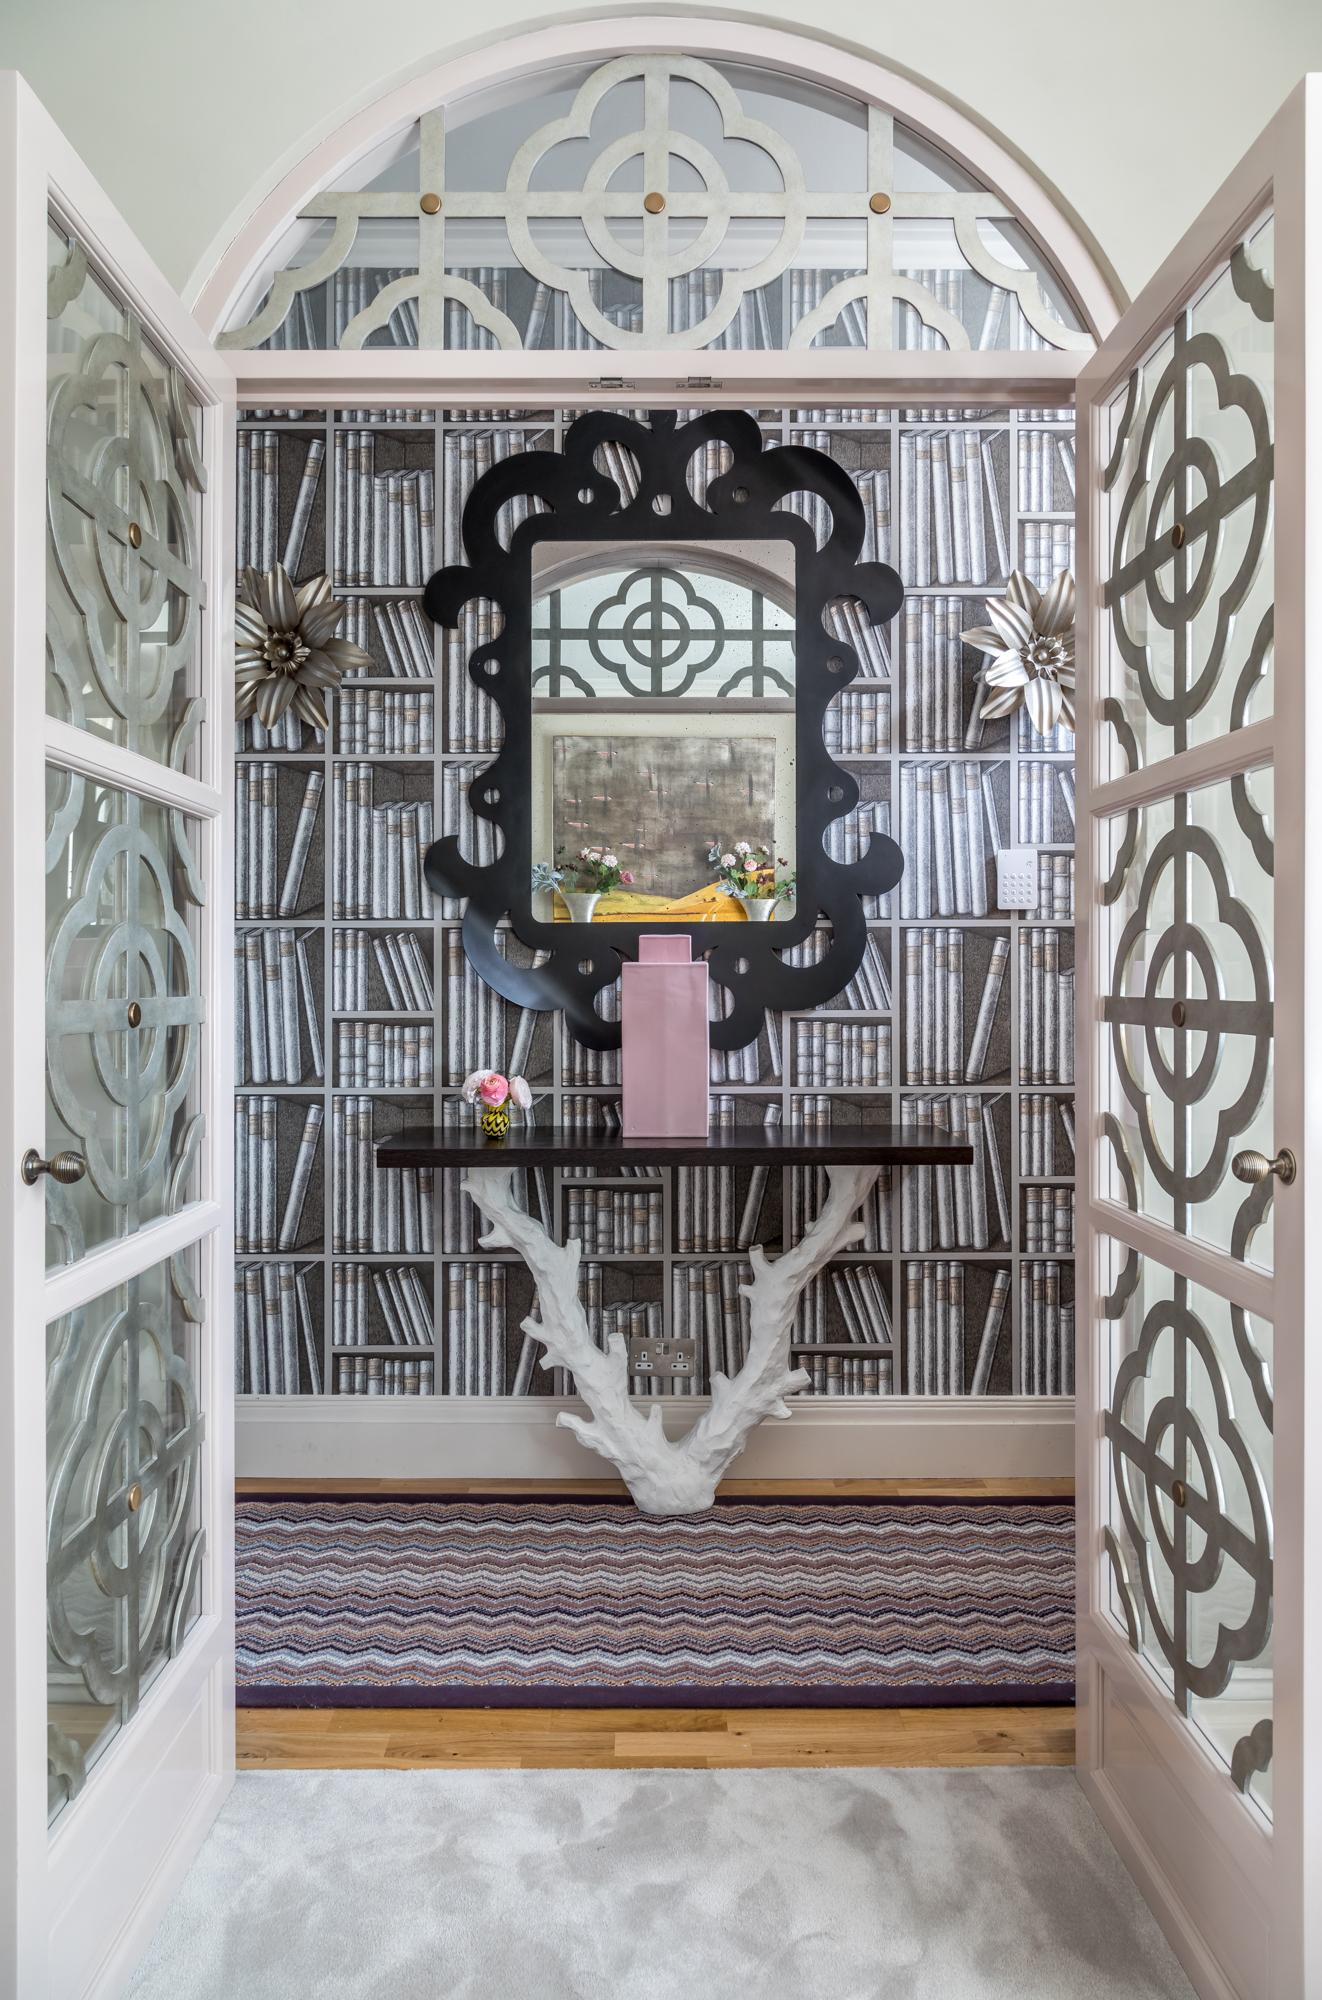 Chelsea - Jonathan Bond Photography, Chelsea, Interior Photography, Residential, House, Photography, Beatty Interiors